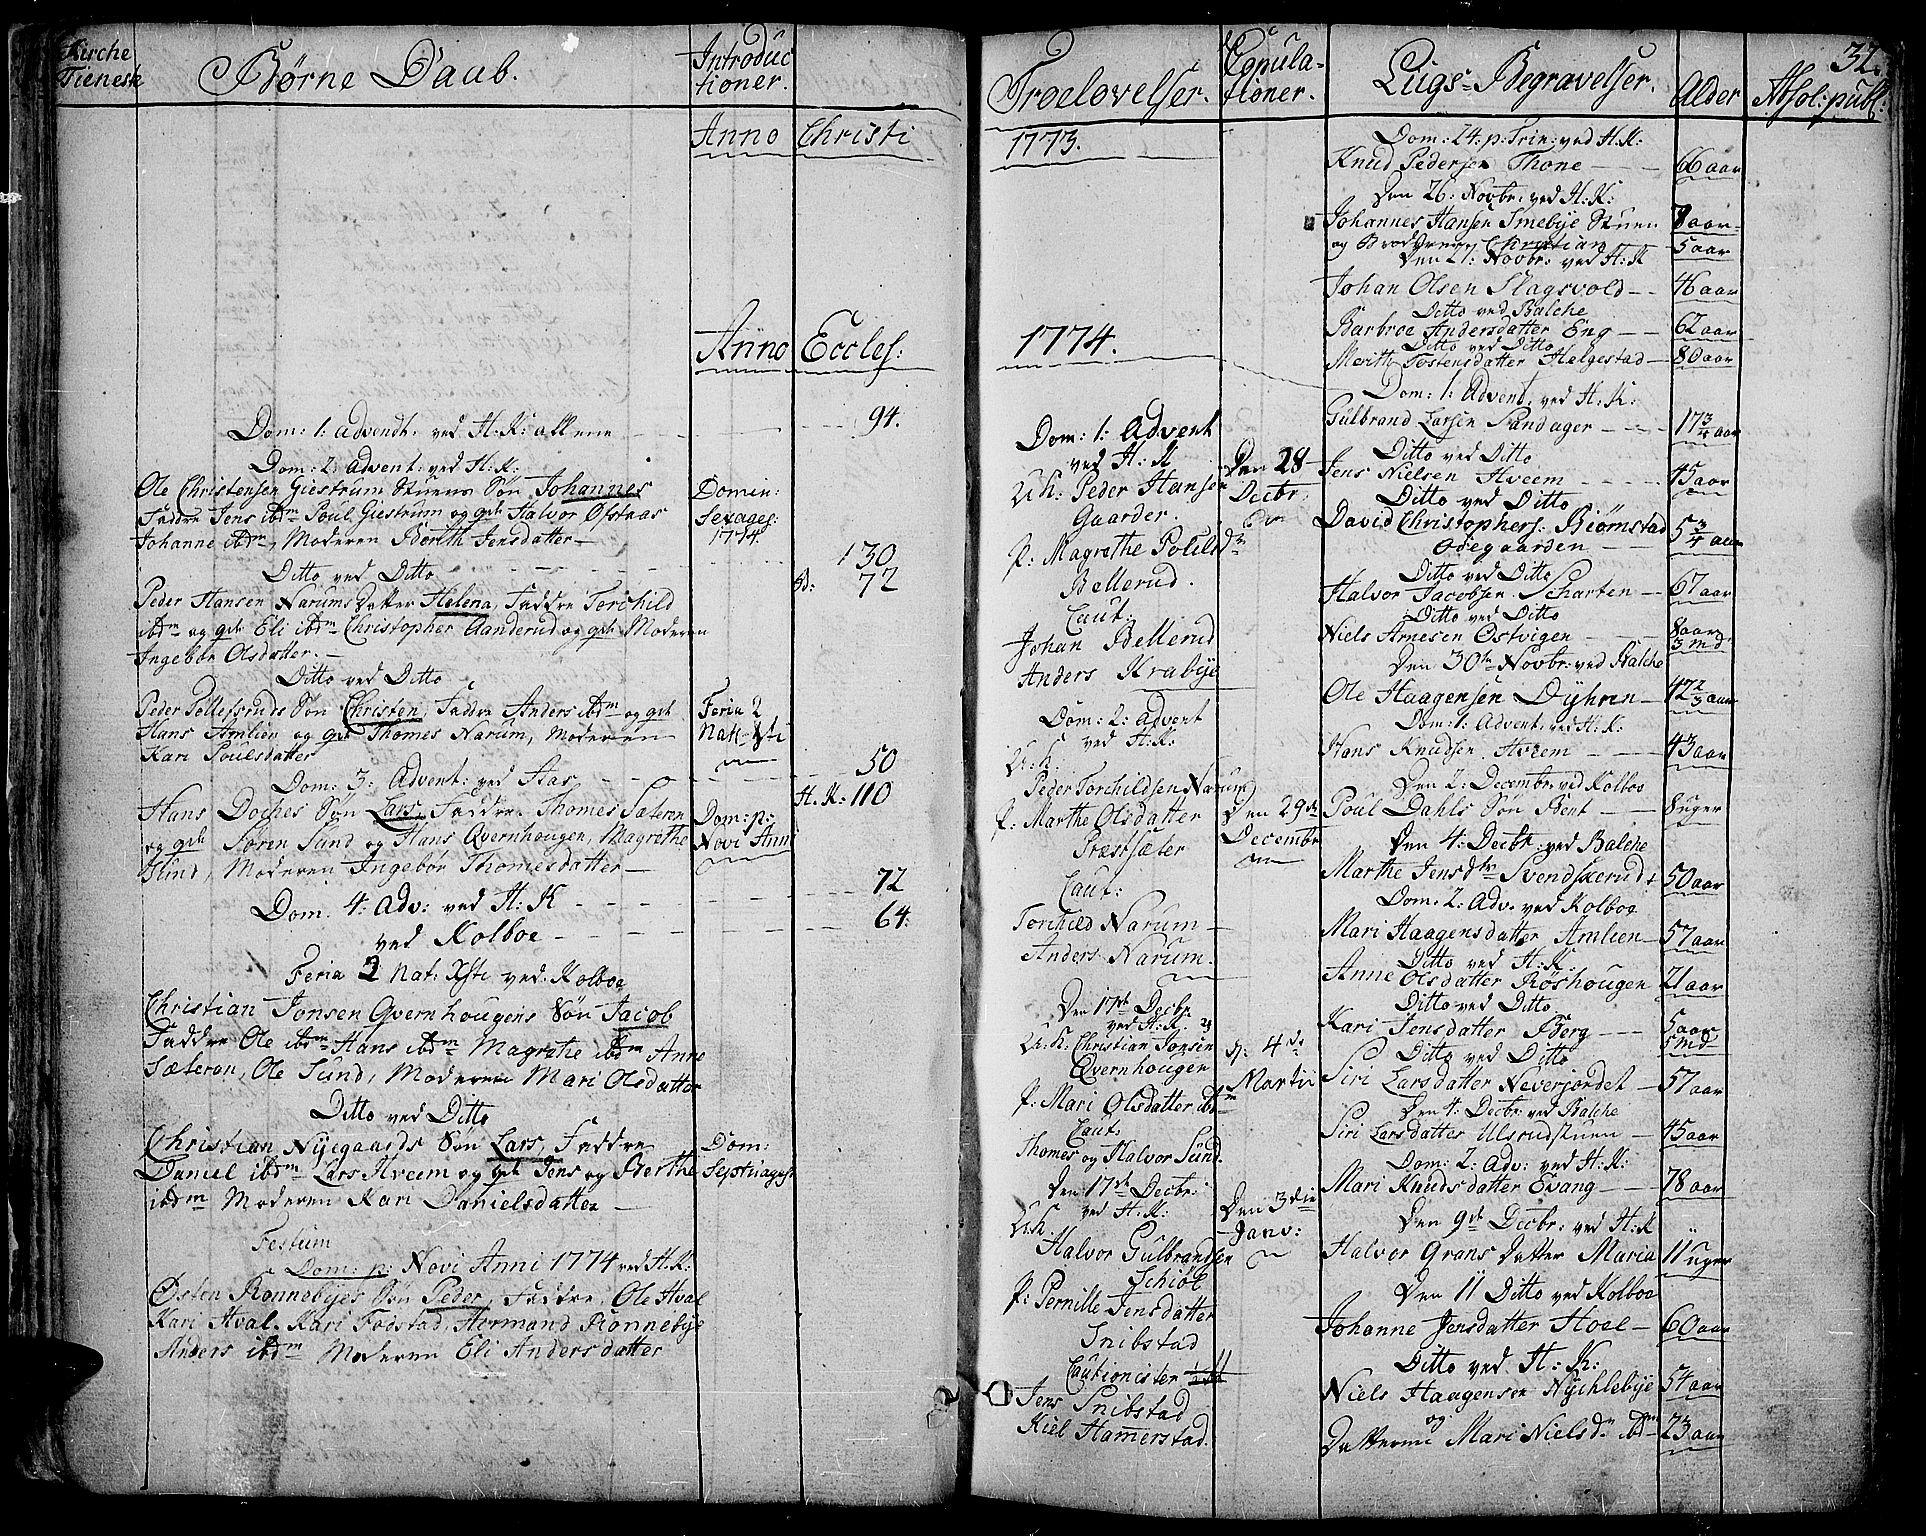 SAH, Toten prestekontor, Ministerialbok nr. 6, 1773-1793, s. 32